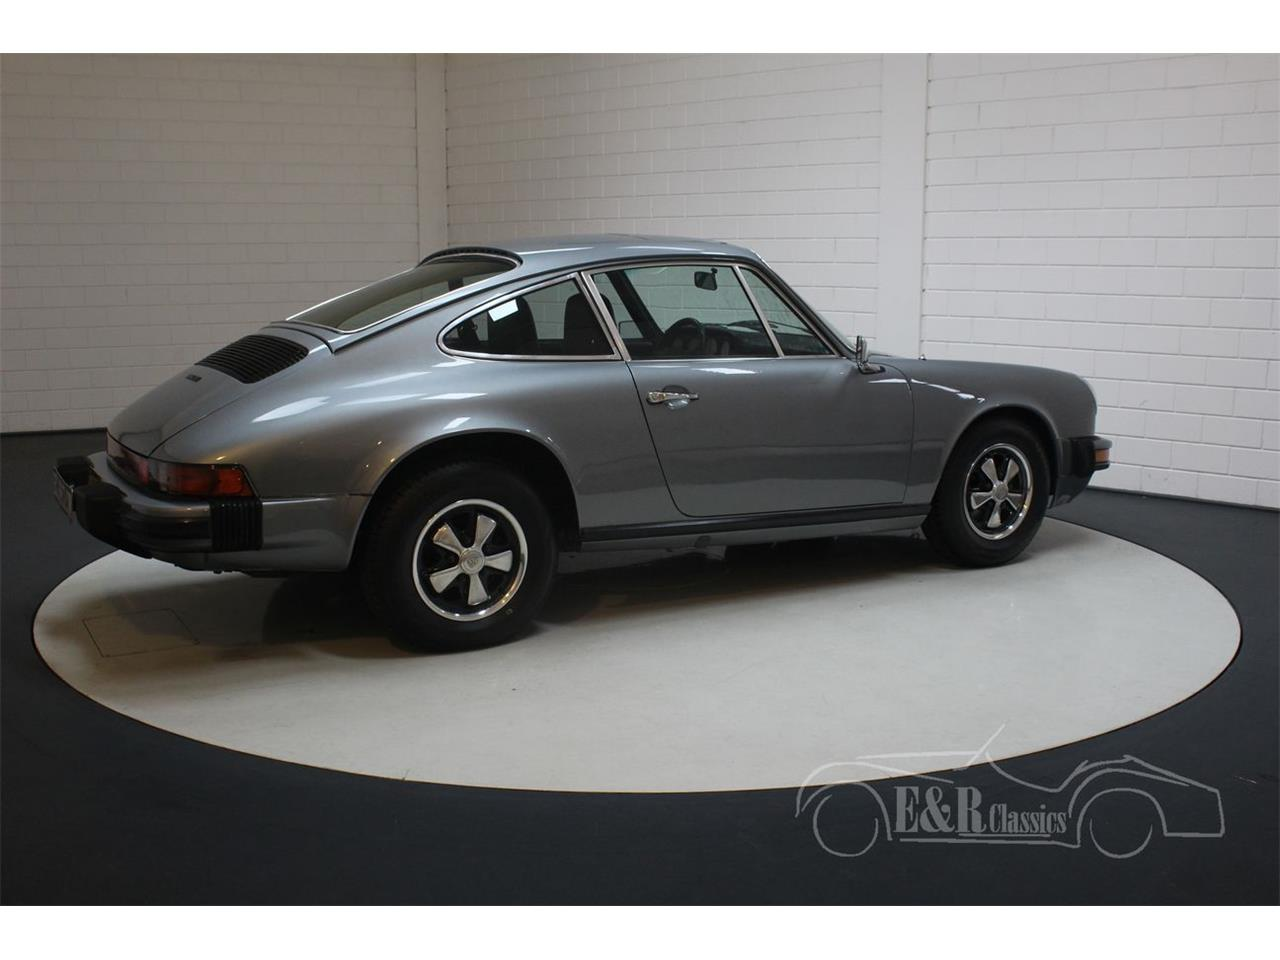 Large Picture of '76 Porsche 912E - $44,700.00 - Q66S